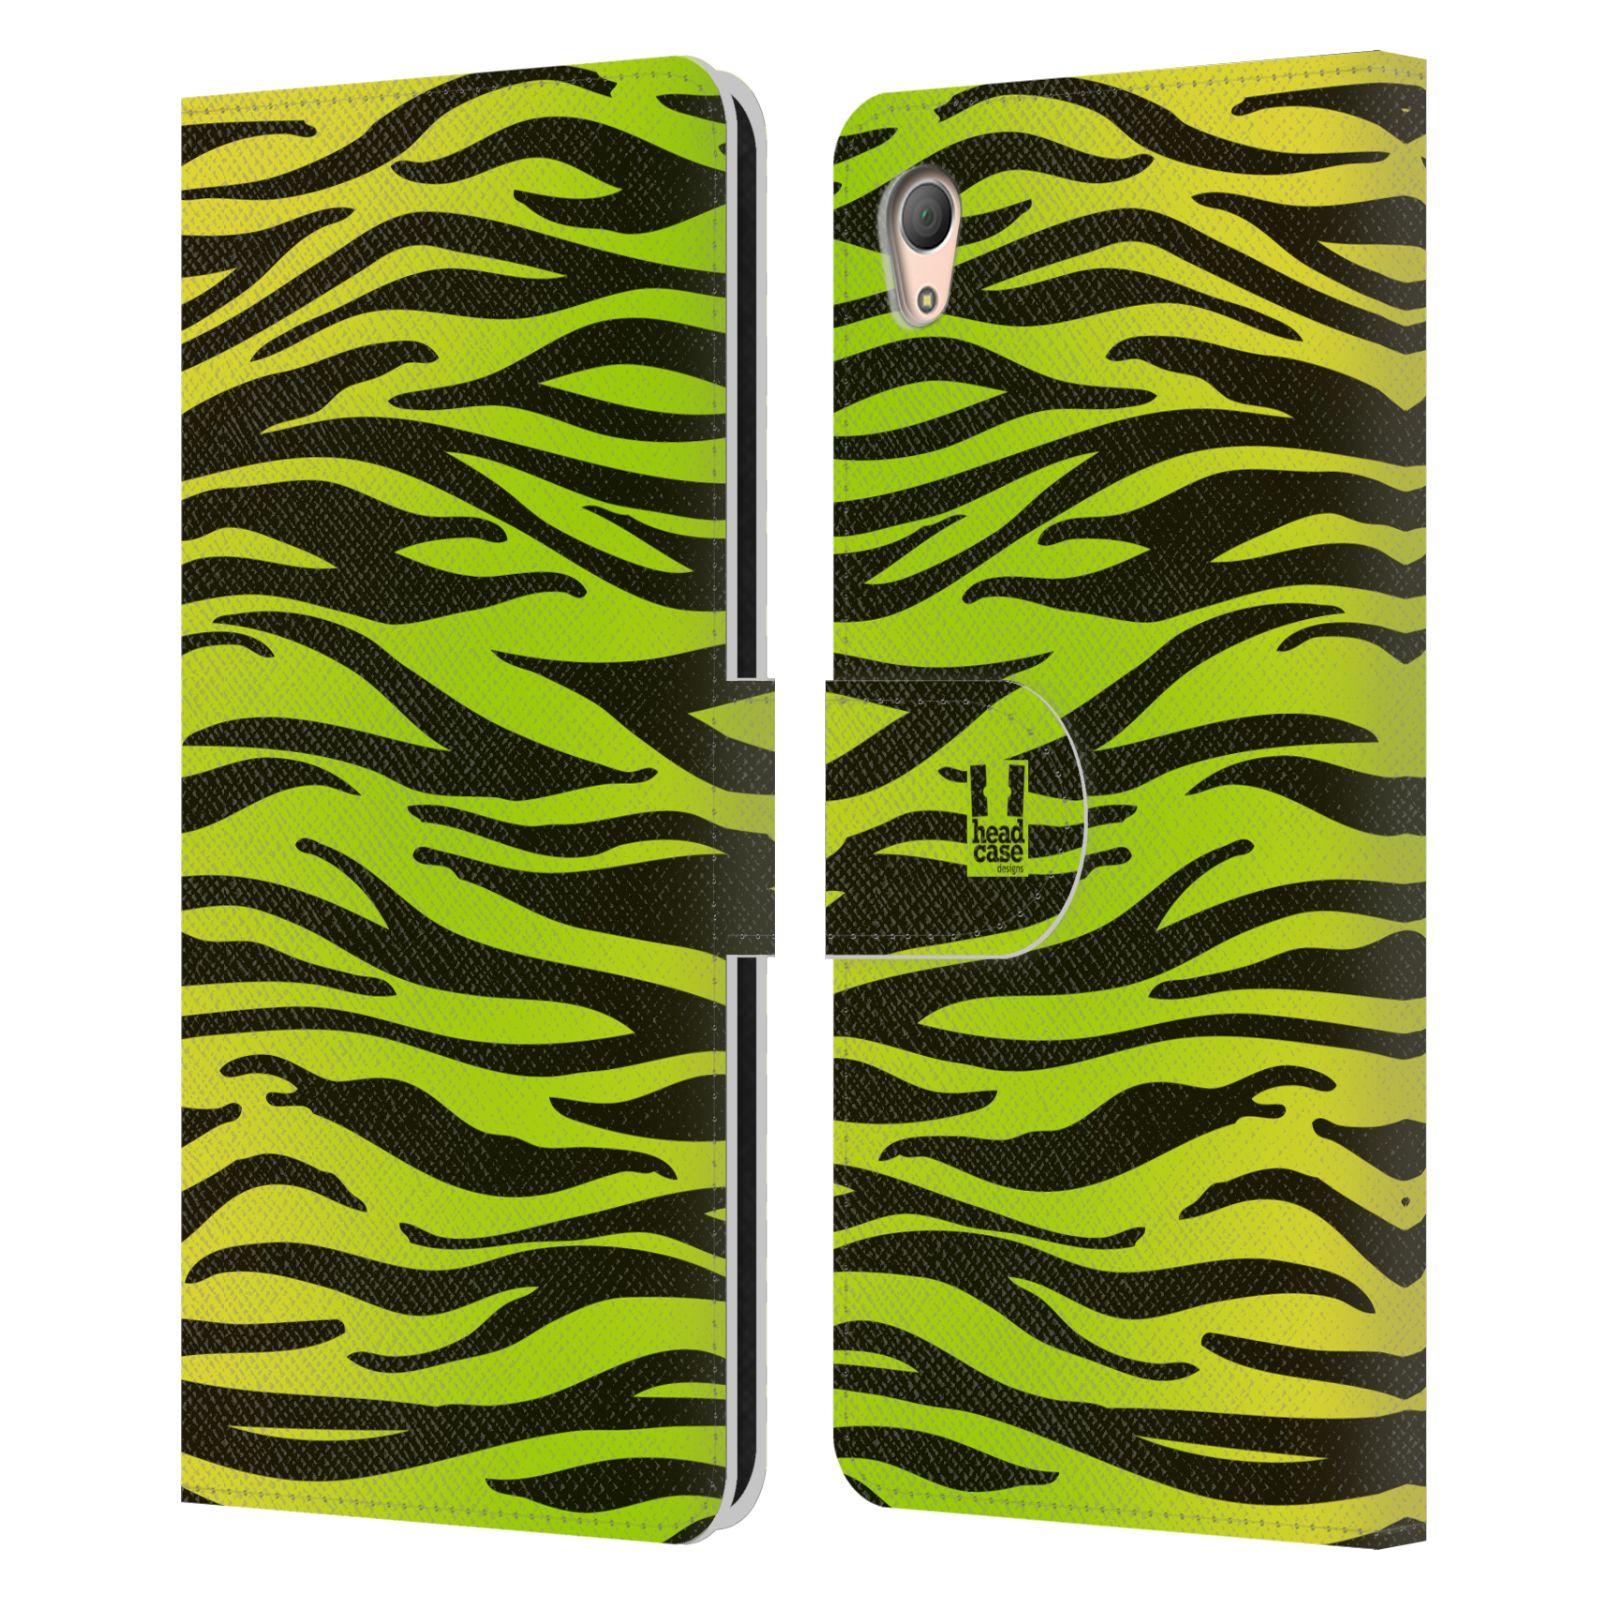 HEAD CASE Flipové pouzdro pro mobil SONY XPERIA Z3+ (PLUS) Zvířecí barevné vzory žlutozelená zebra